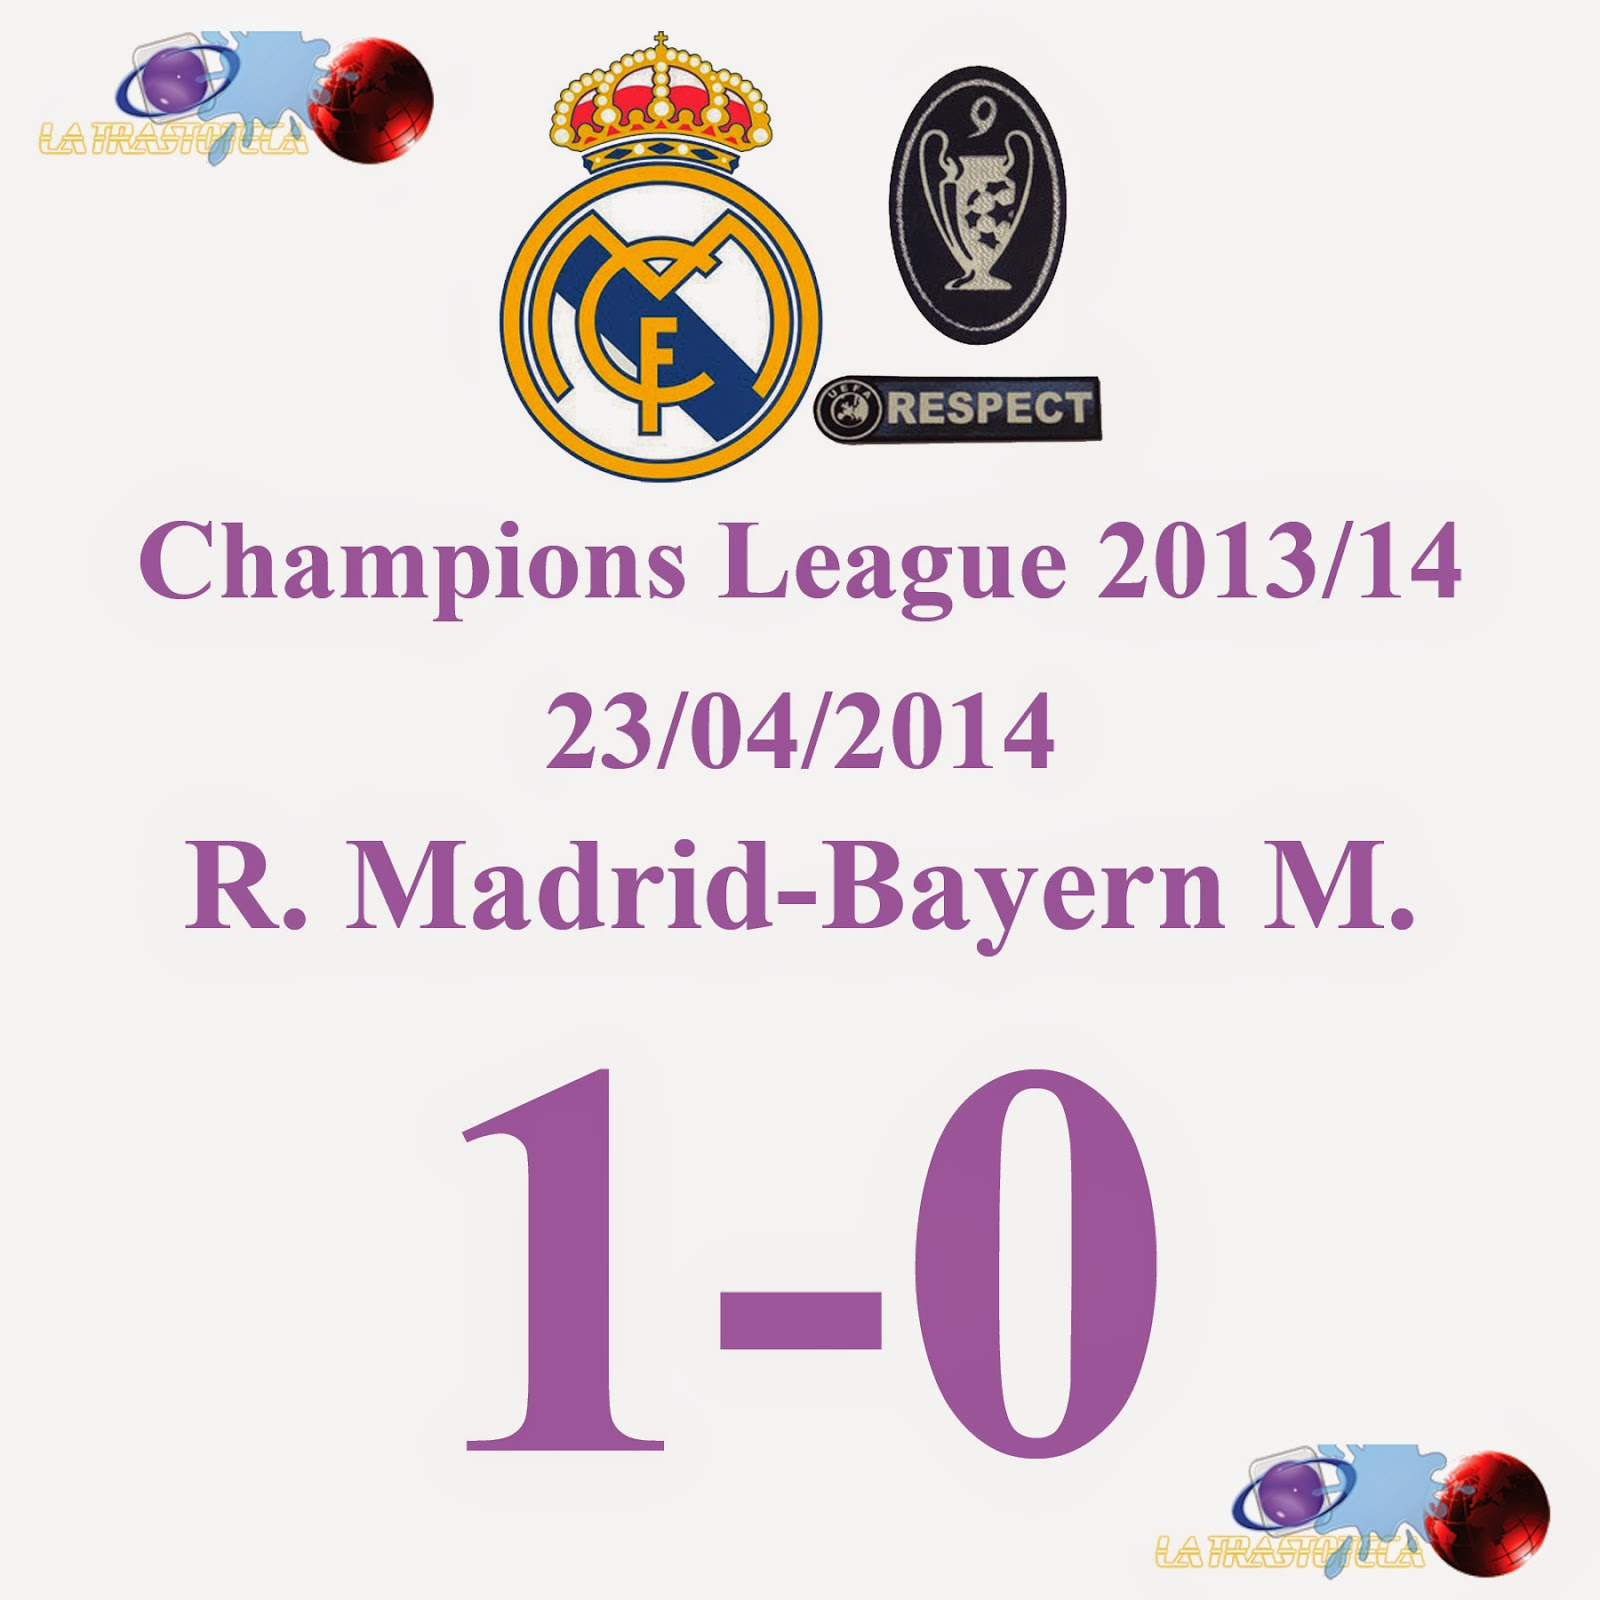 Karim Benzema (1-0) Semifinales de Champions League - 23/04/2014